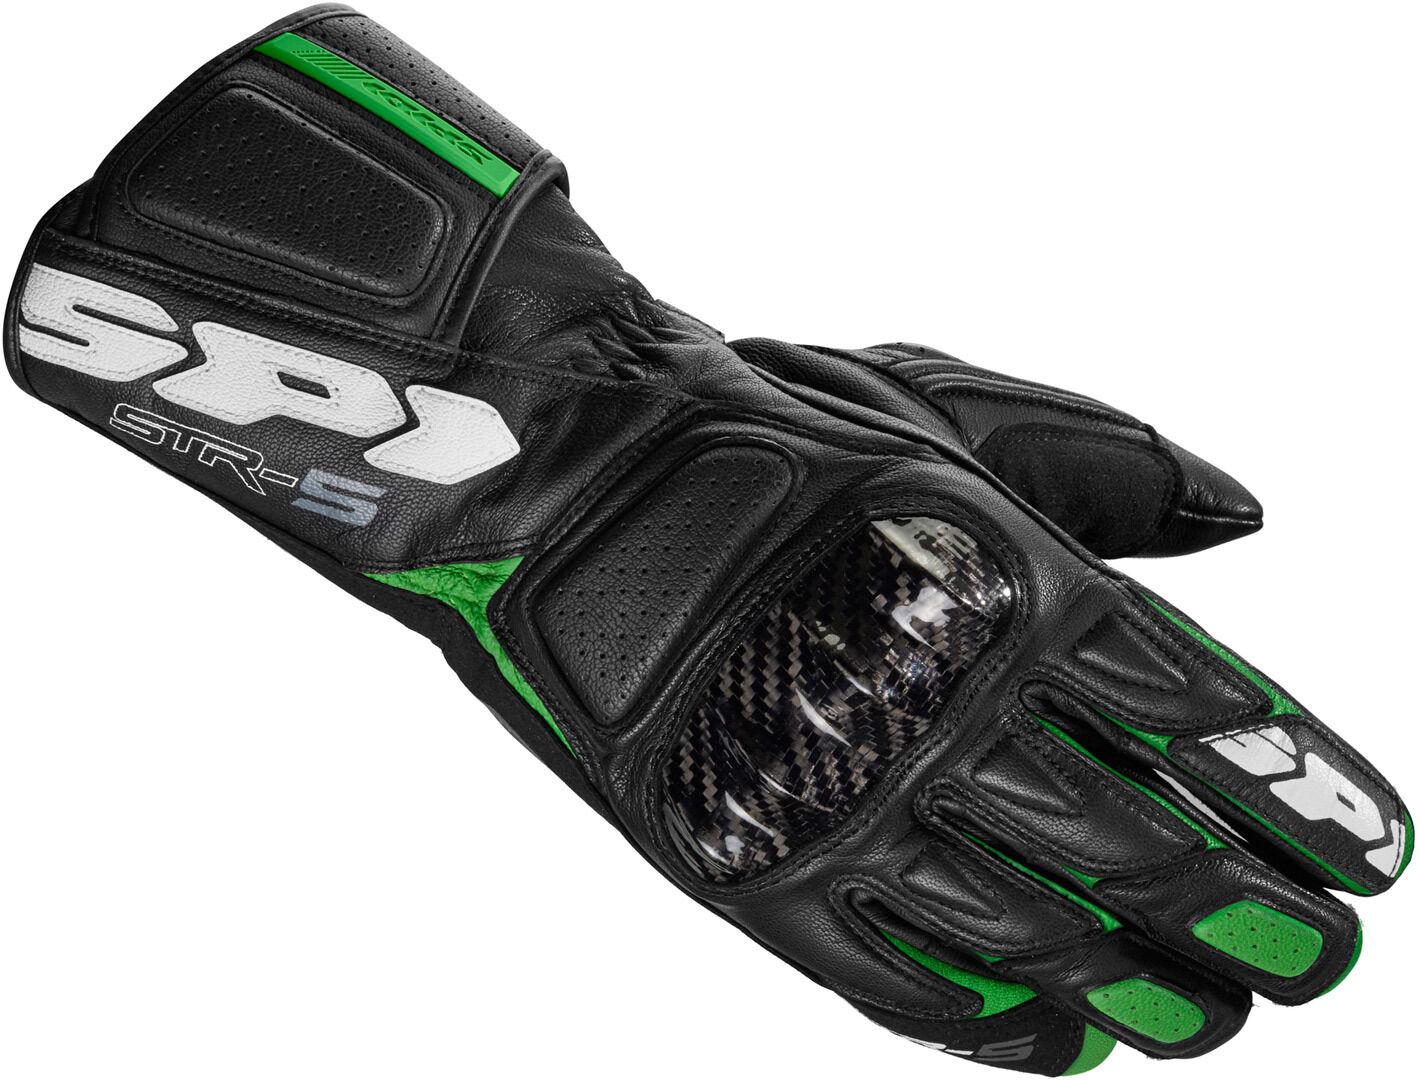 Spidi STR-5 Gloves Black Green 3XL